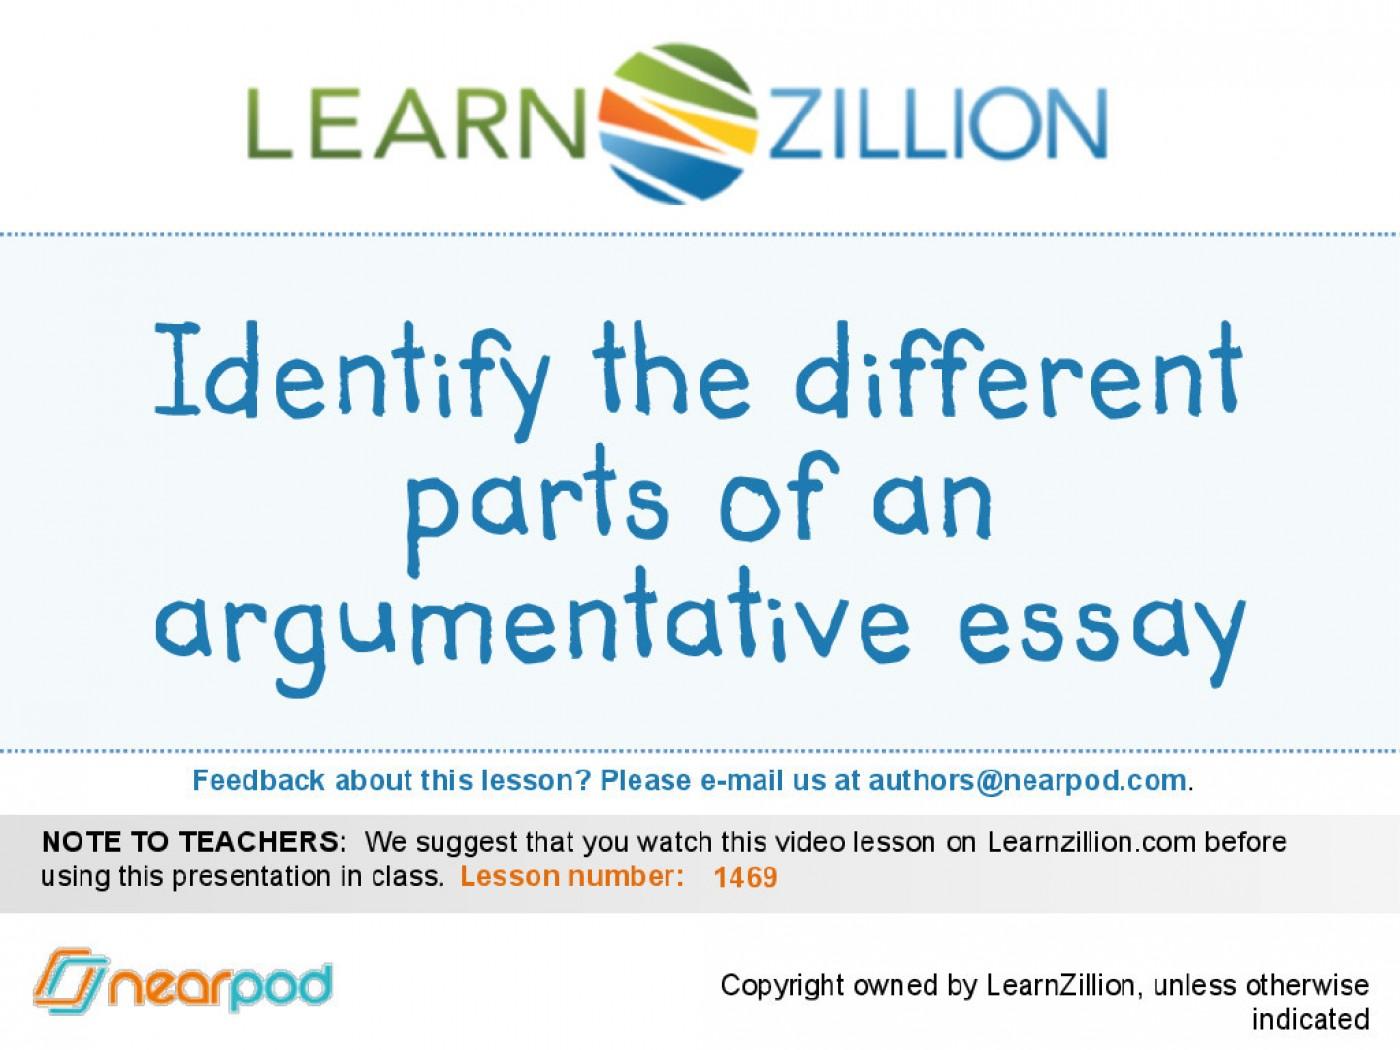 008 Essay Example Iconflashawsaccesskeyidakiainyagm2ywp2owqbaexpires2147483647signatureei12bysbrrui94ogmyp2bd8abs2fni3d1383850965 Parts Of Singular Argumentative An Quiz Middle School Evidence 1400